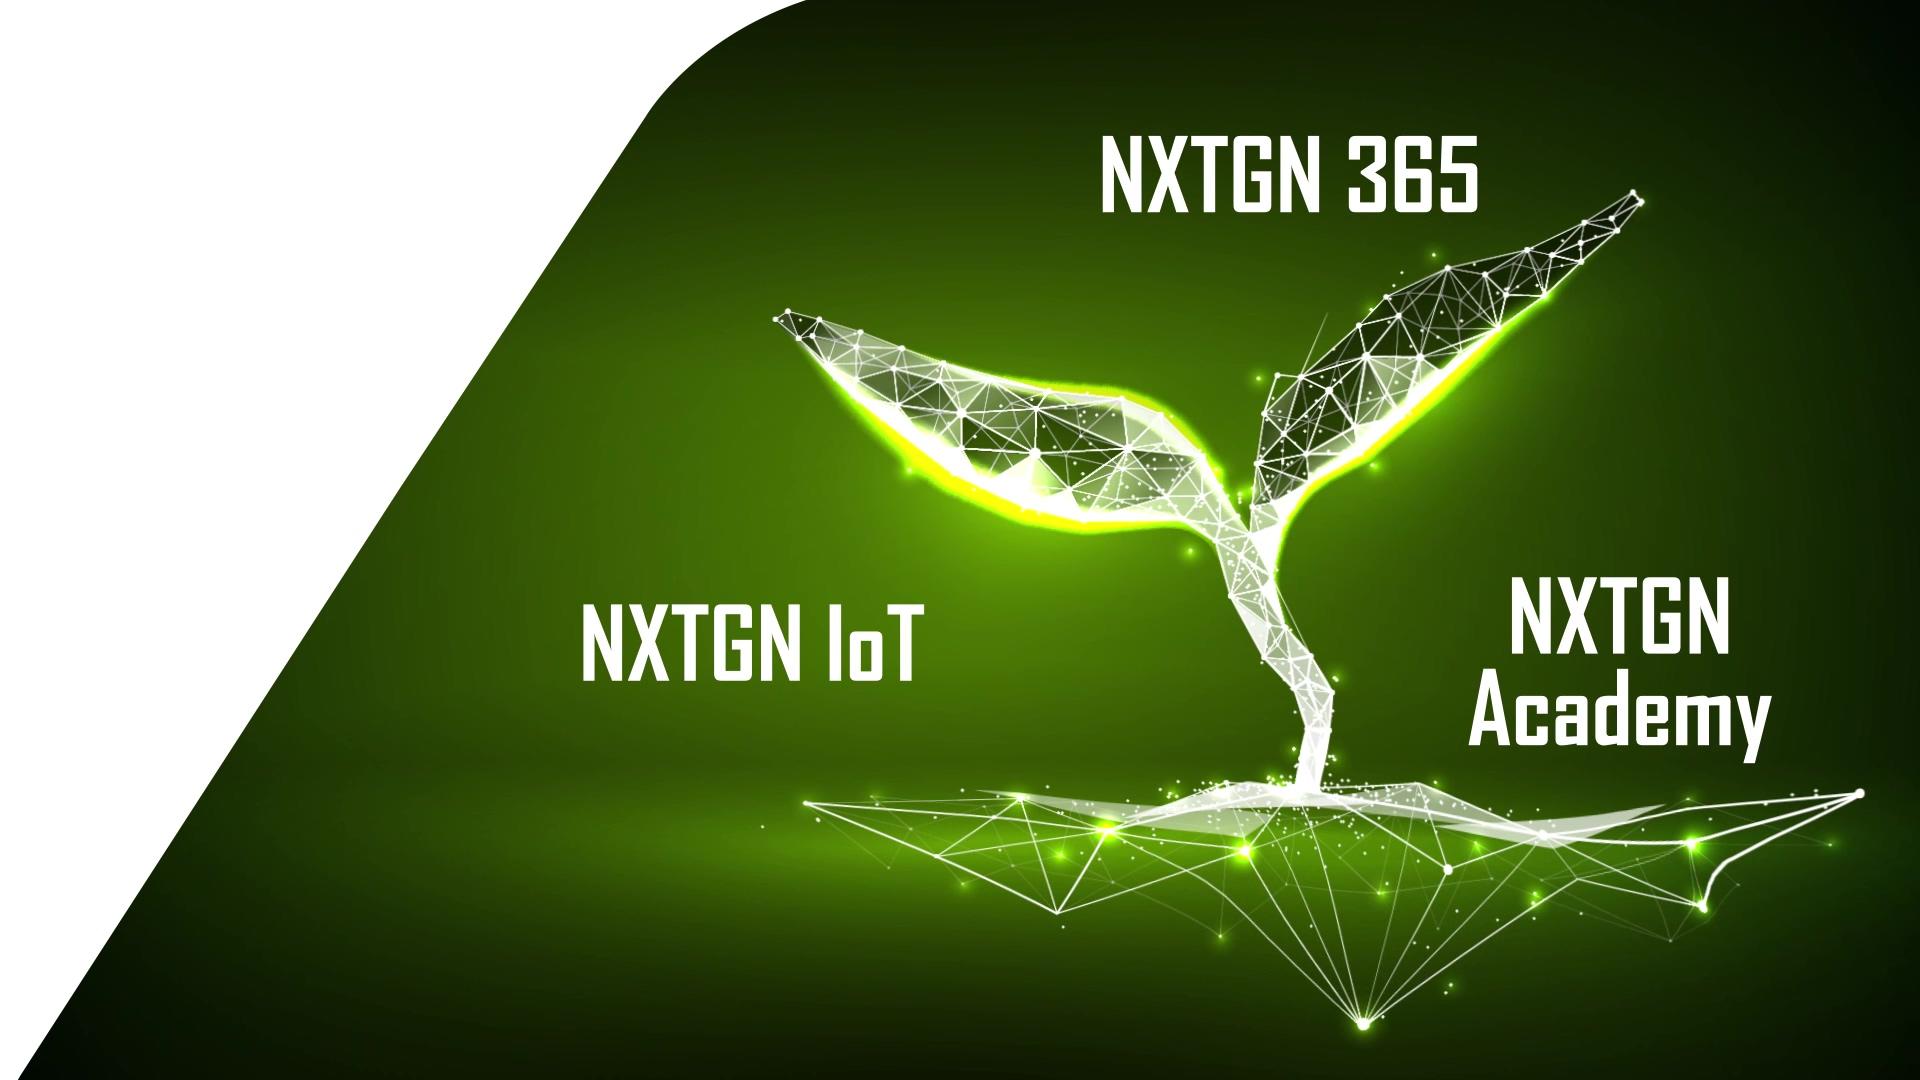 NXTGN-Video-Unternehmen